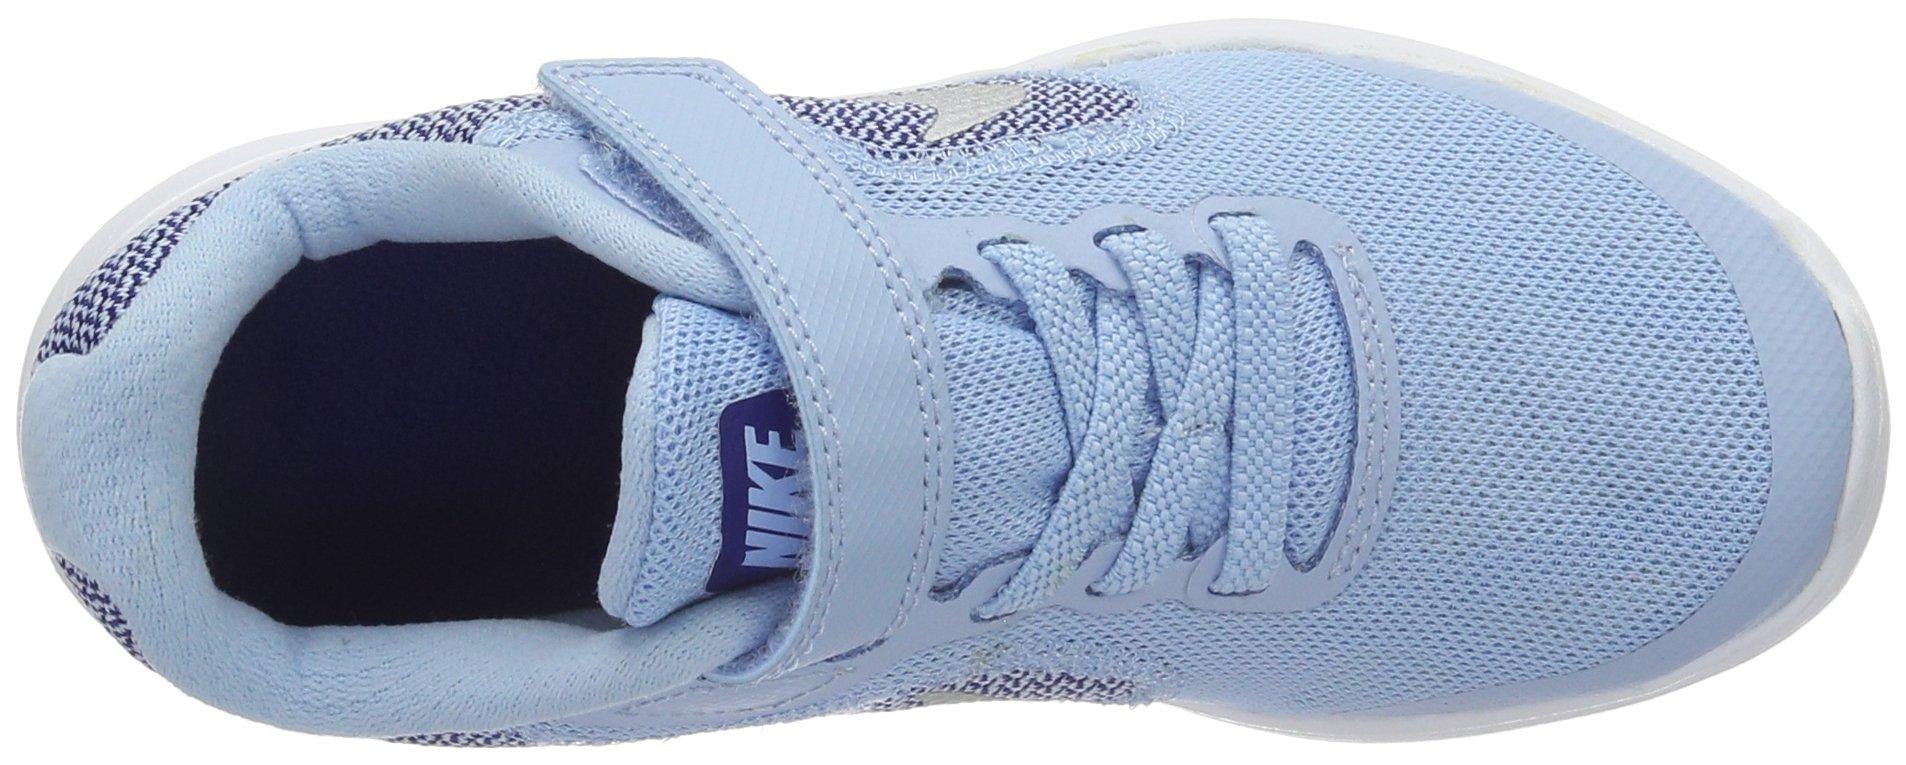 NIKE Kids' Revolution 3 (Psv) Running-Shoes, Bluecap/Metallic Silver/Deep Royal Blue, 1 M US Little Kid by Nike (Image #7)